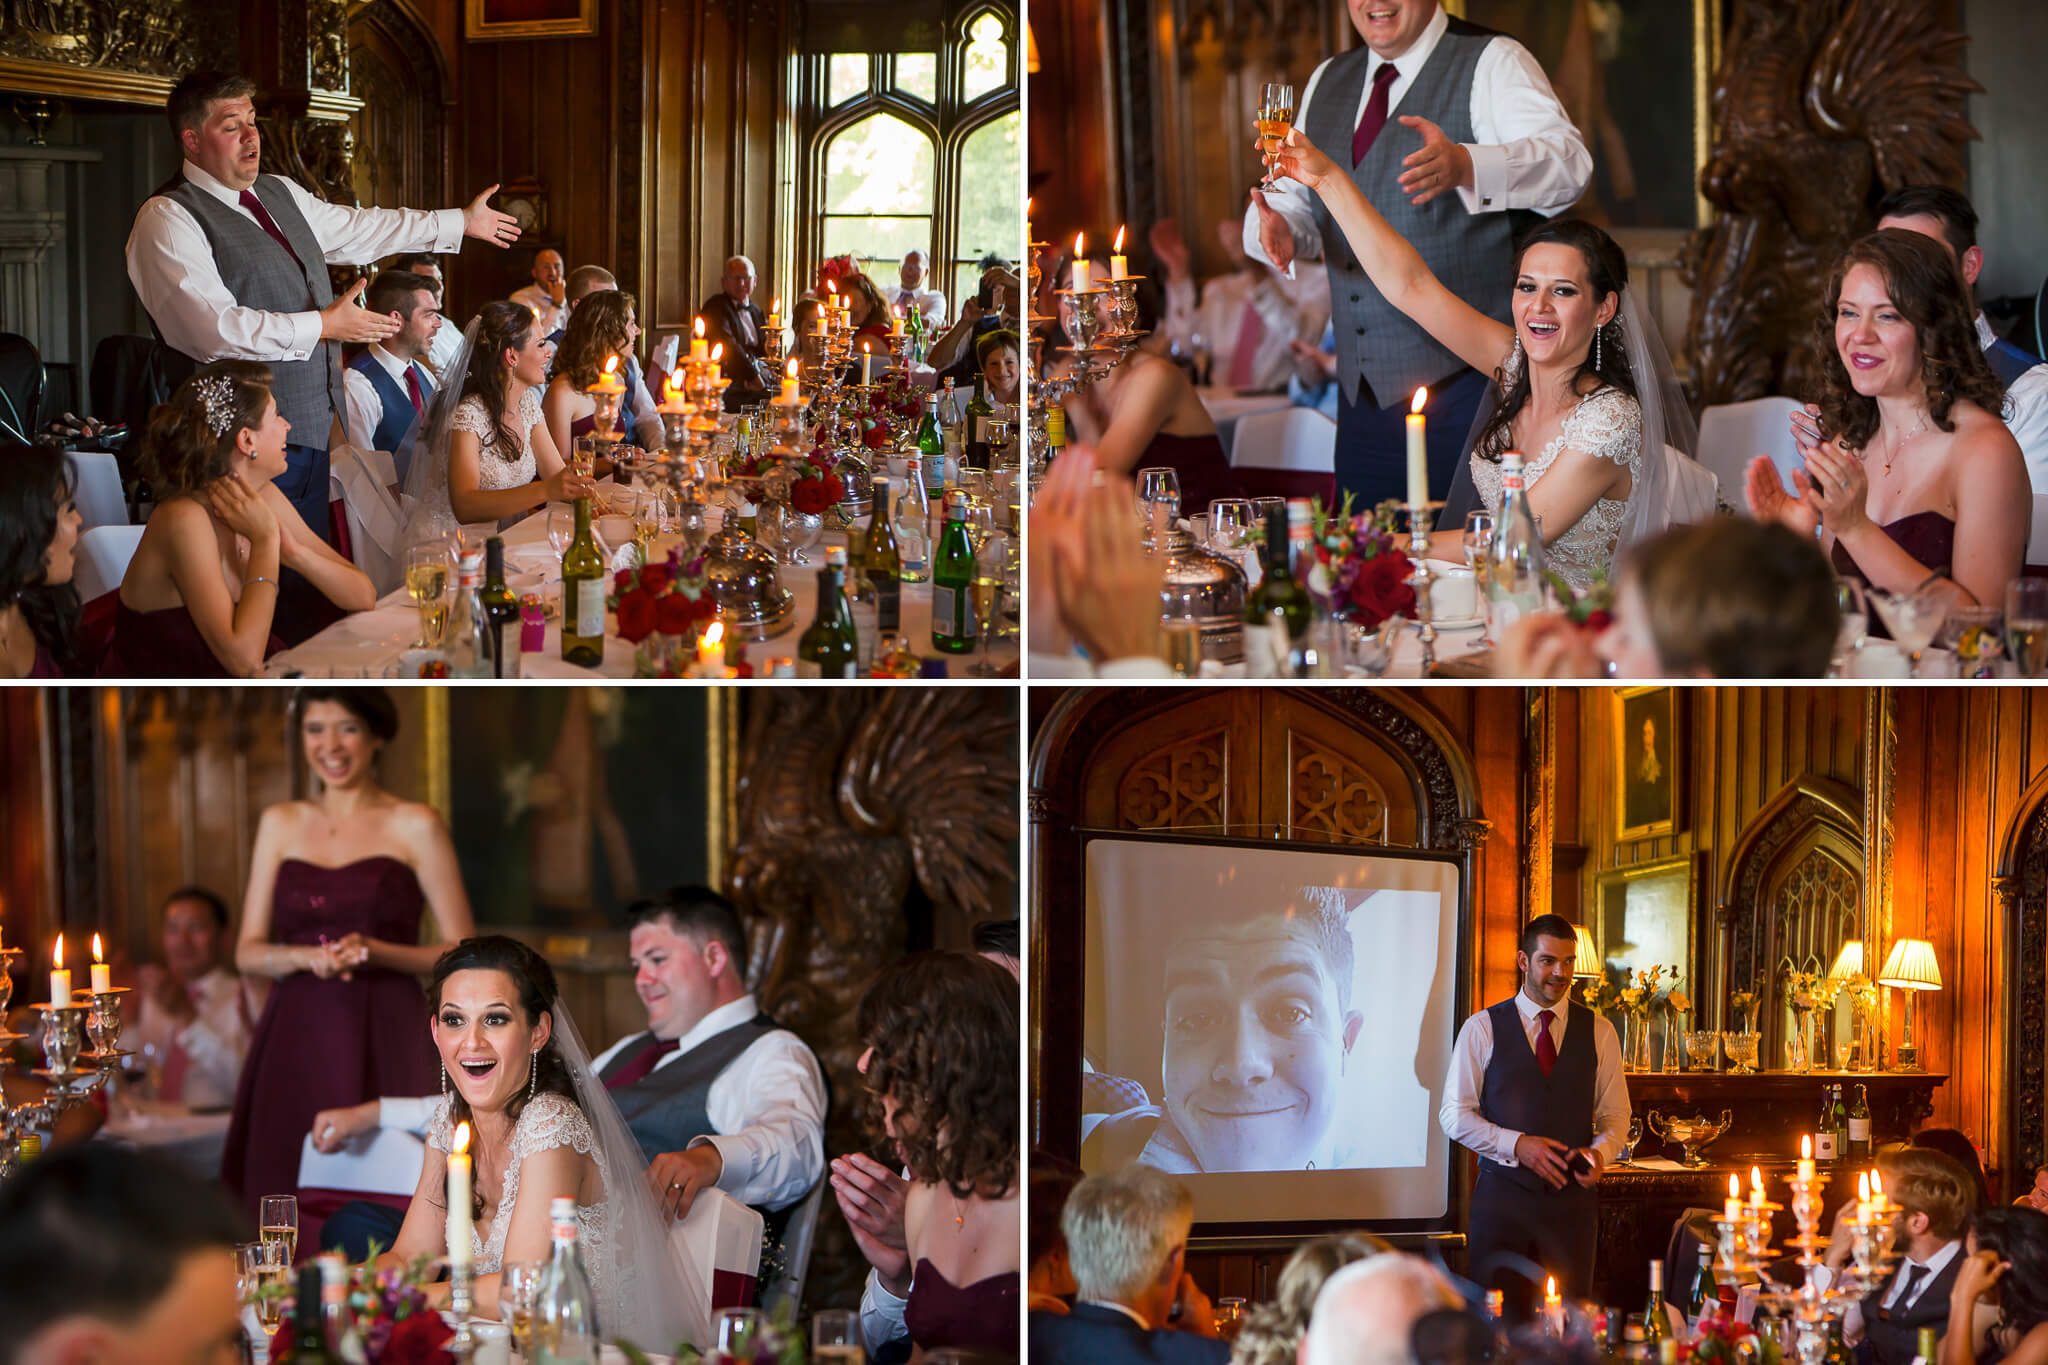 duns-castle-wedding-photograper-scotland-stanbury-photography-015